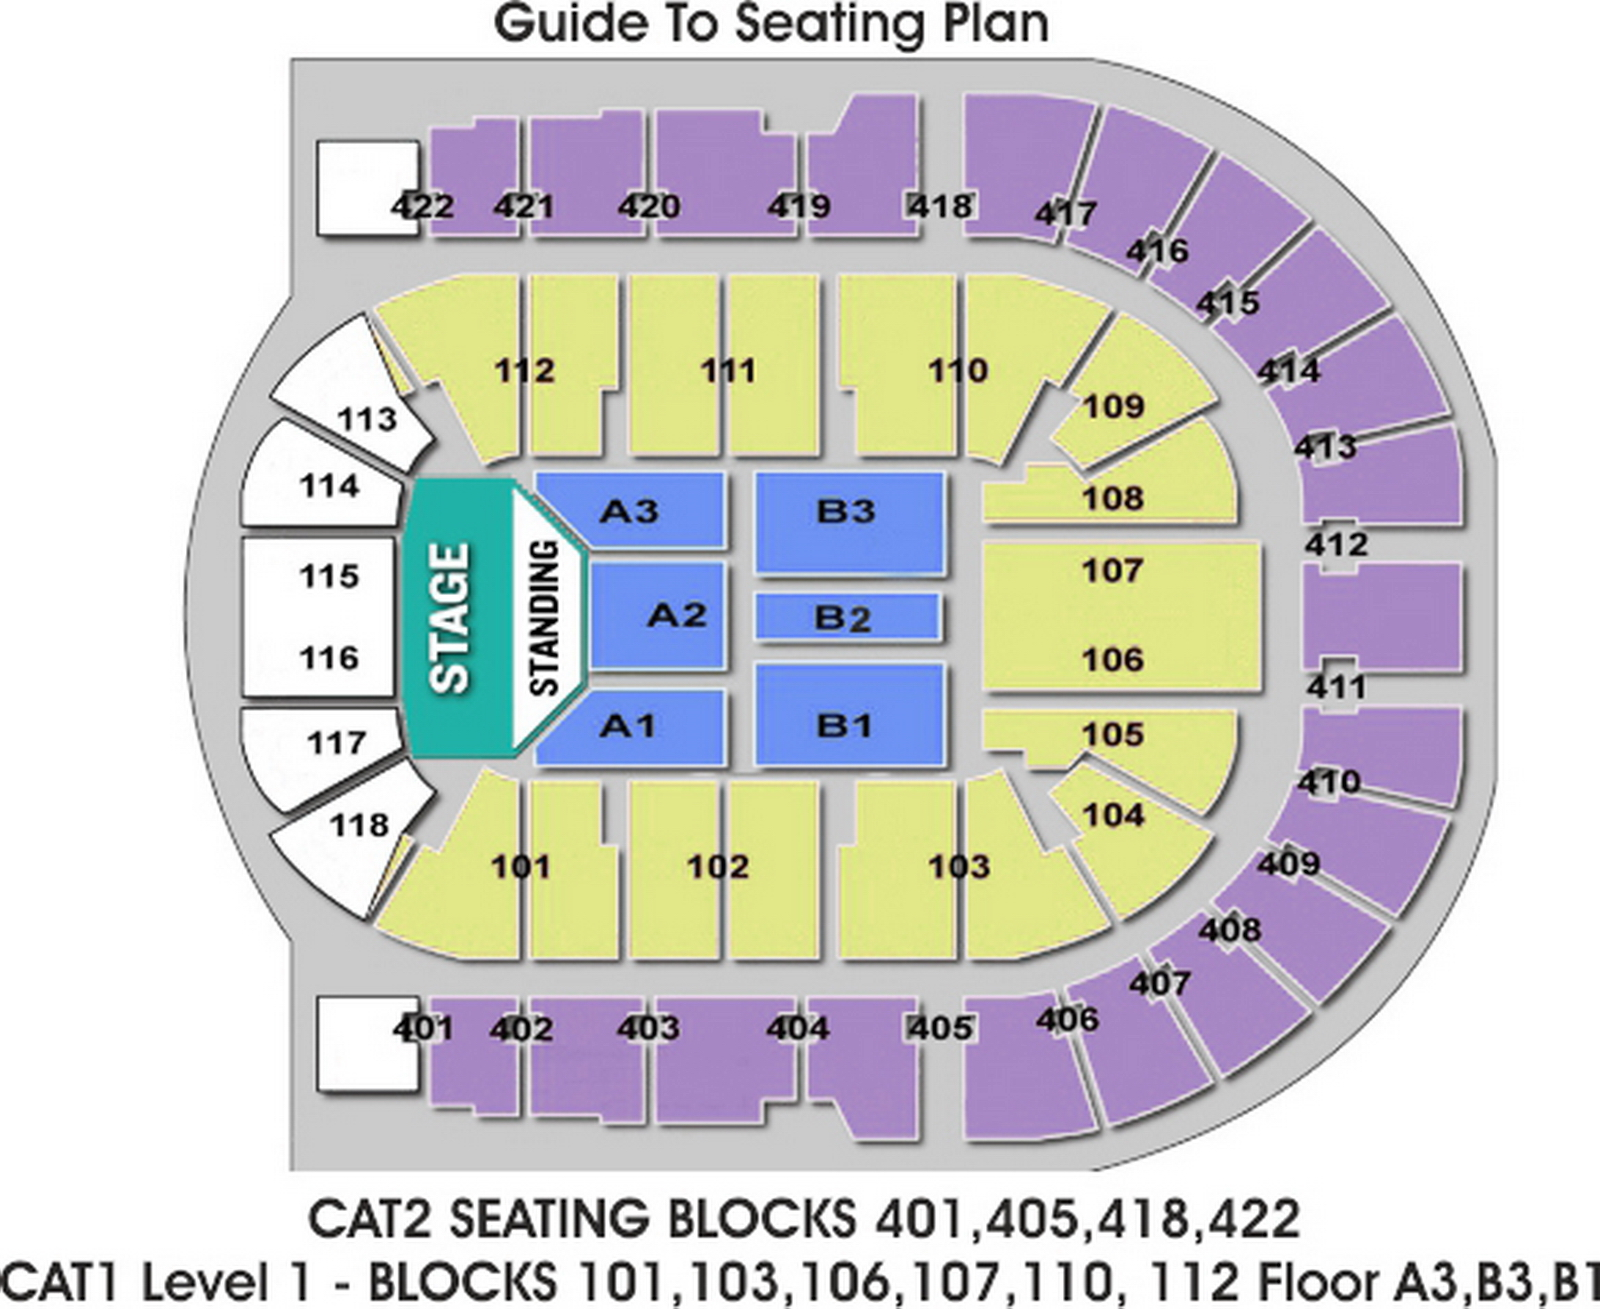 O2 Arena Seating Map O2 Arena London seating plan   Detailed seat numbers   MapaPlan.com O2 Arena Seating Map